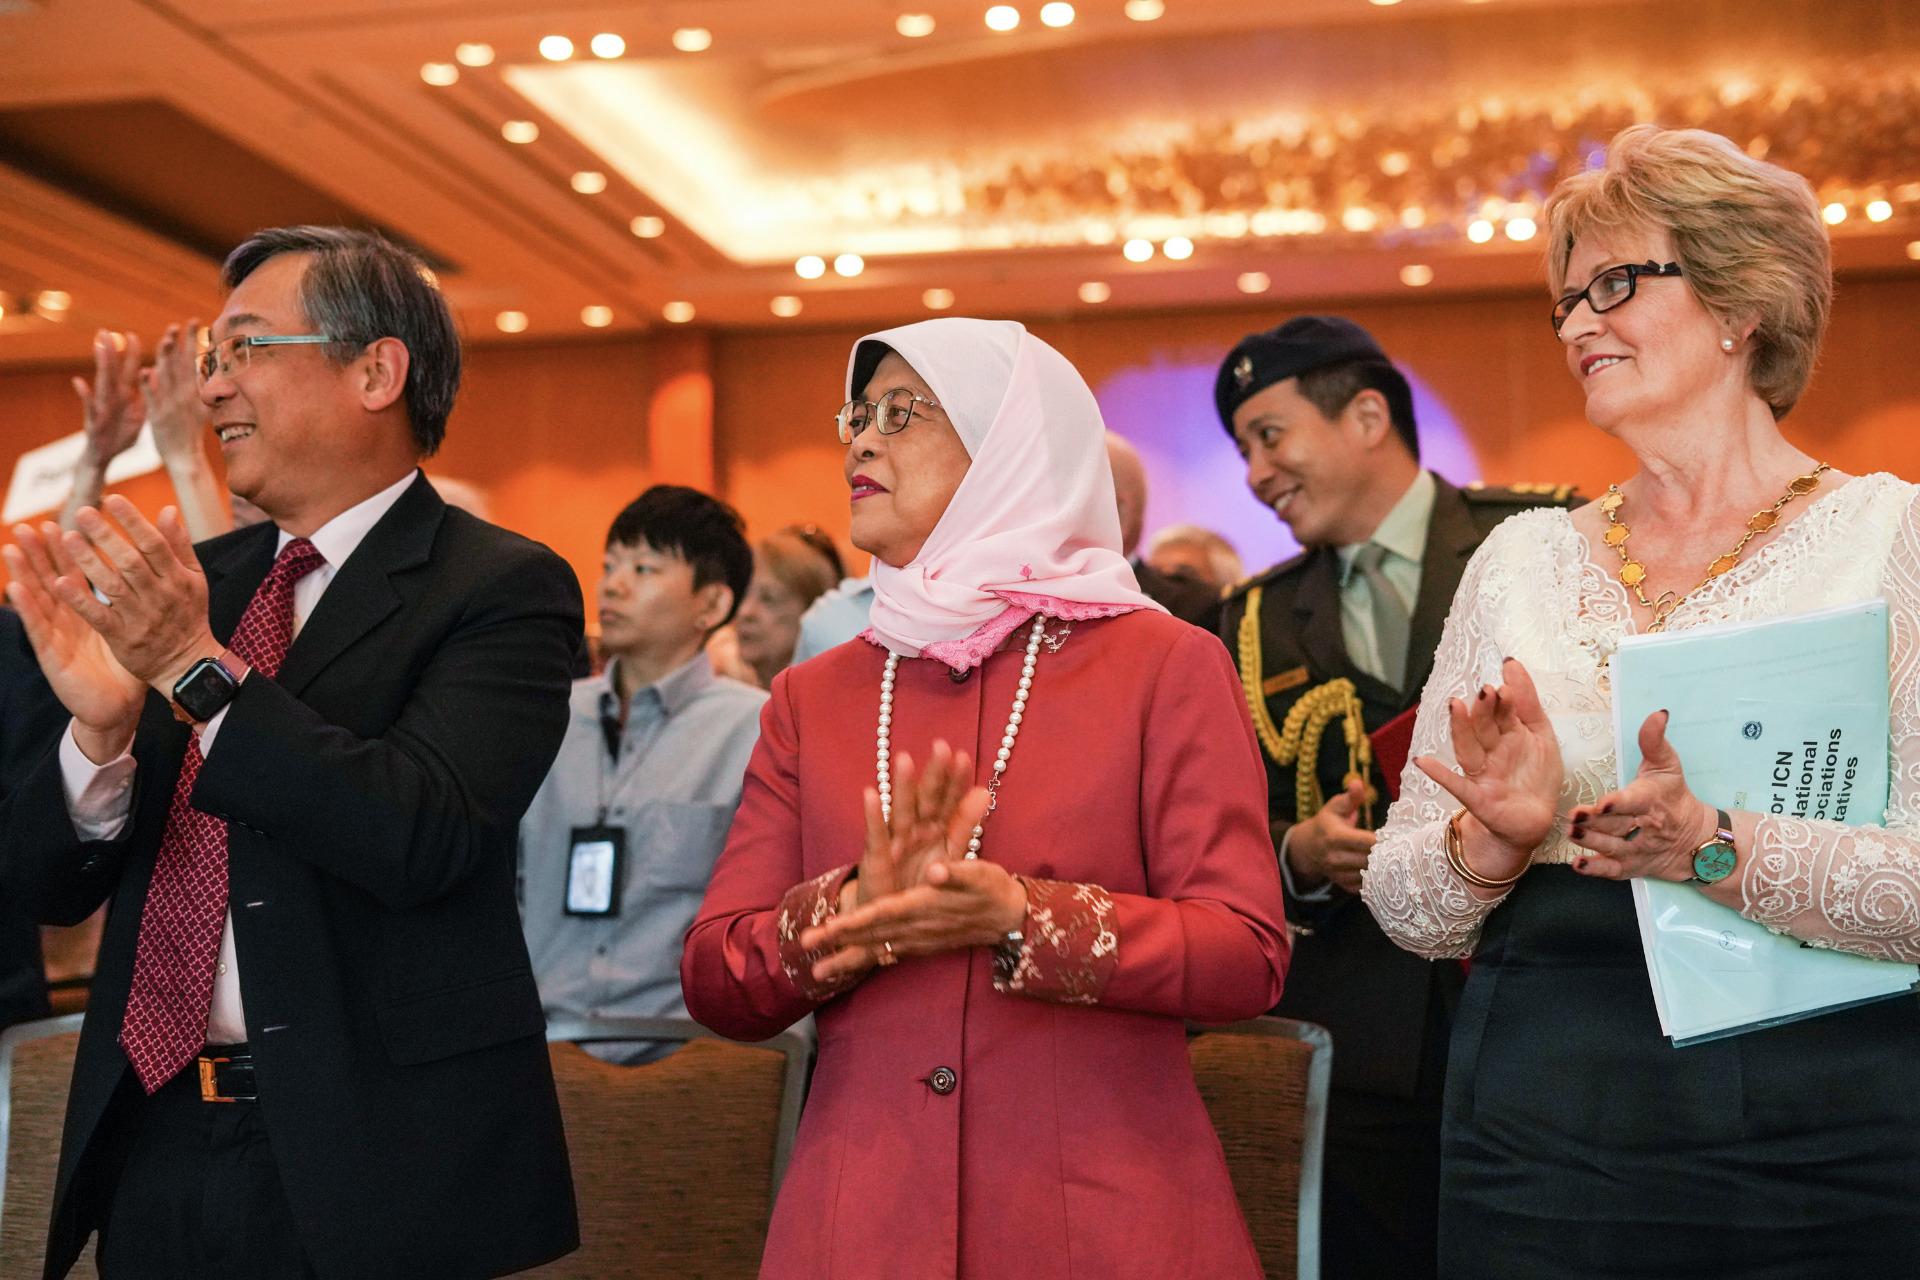 ICN Congress 2019 Singapore | ICN - International Council of